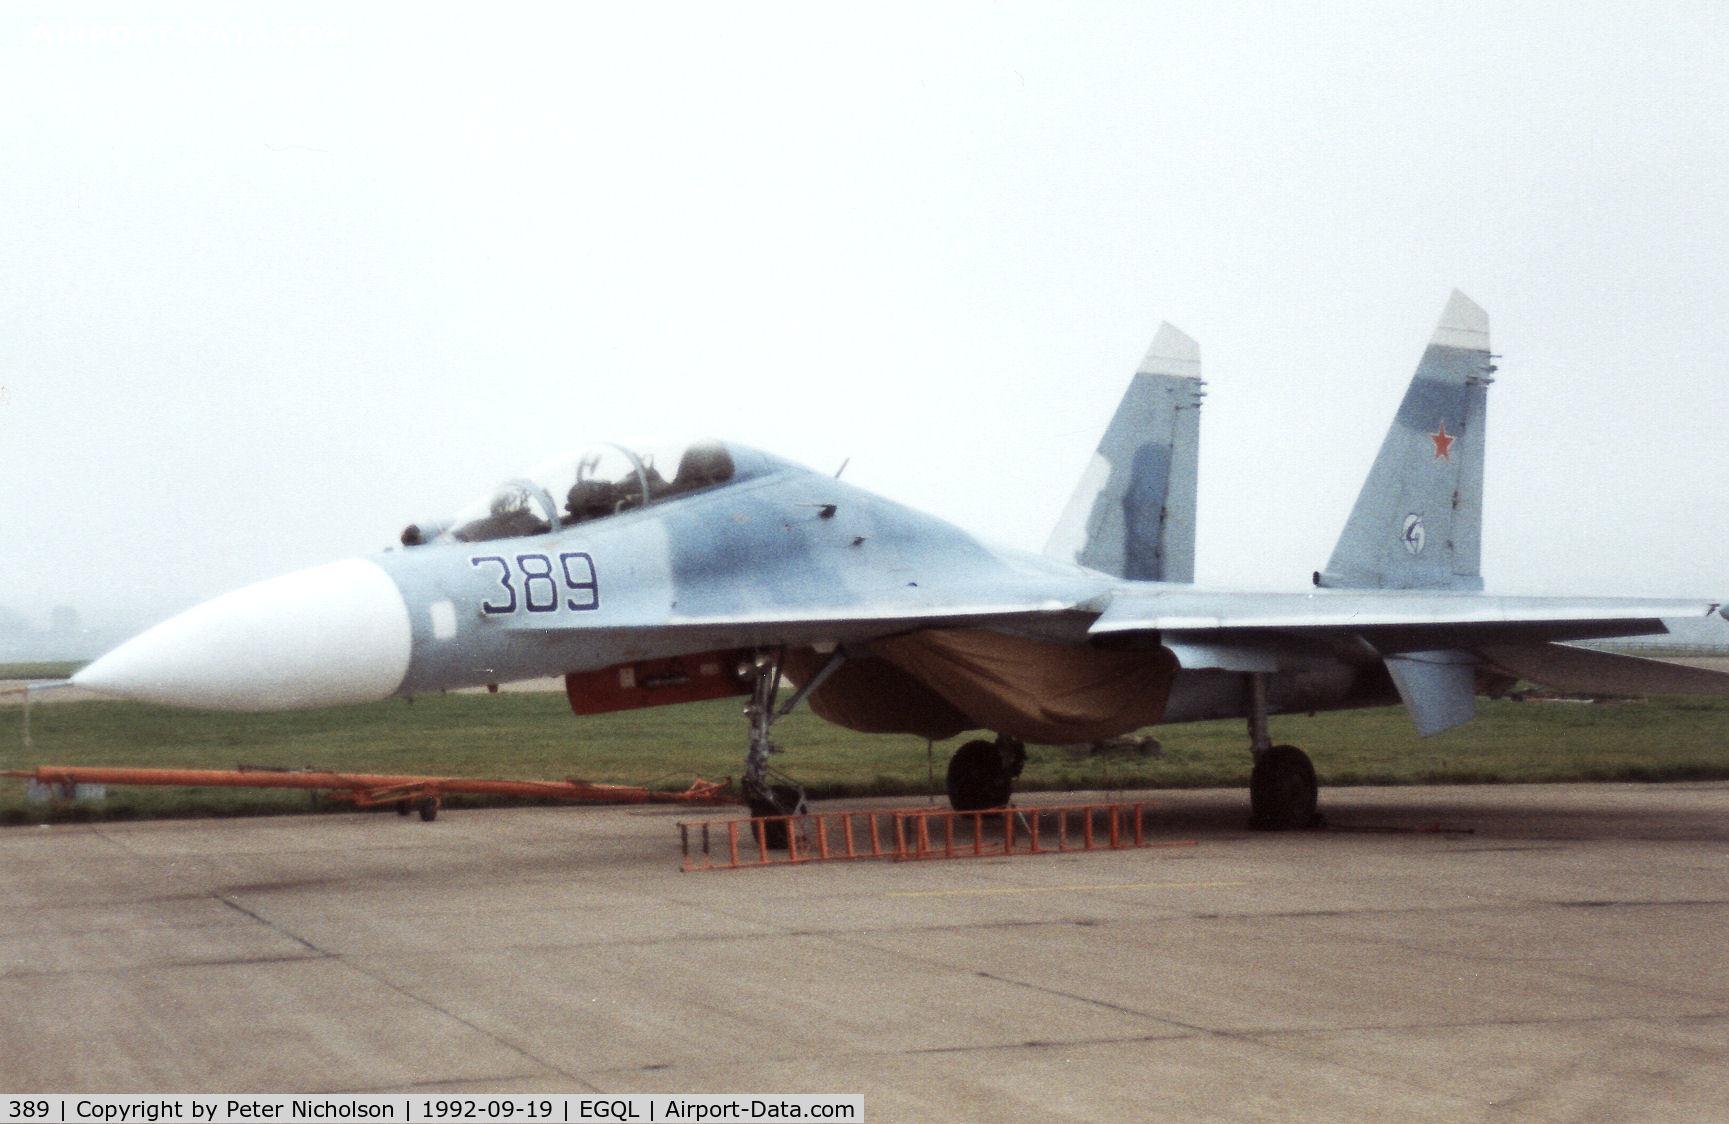 389, Sukhoi Su-27UB C/N 25389, Su-27B Flanker from Kubinka Air Base on display at the 1992 RAF Leuchars Airshow.